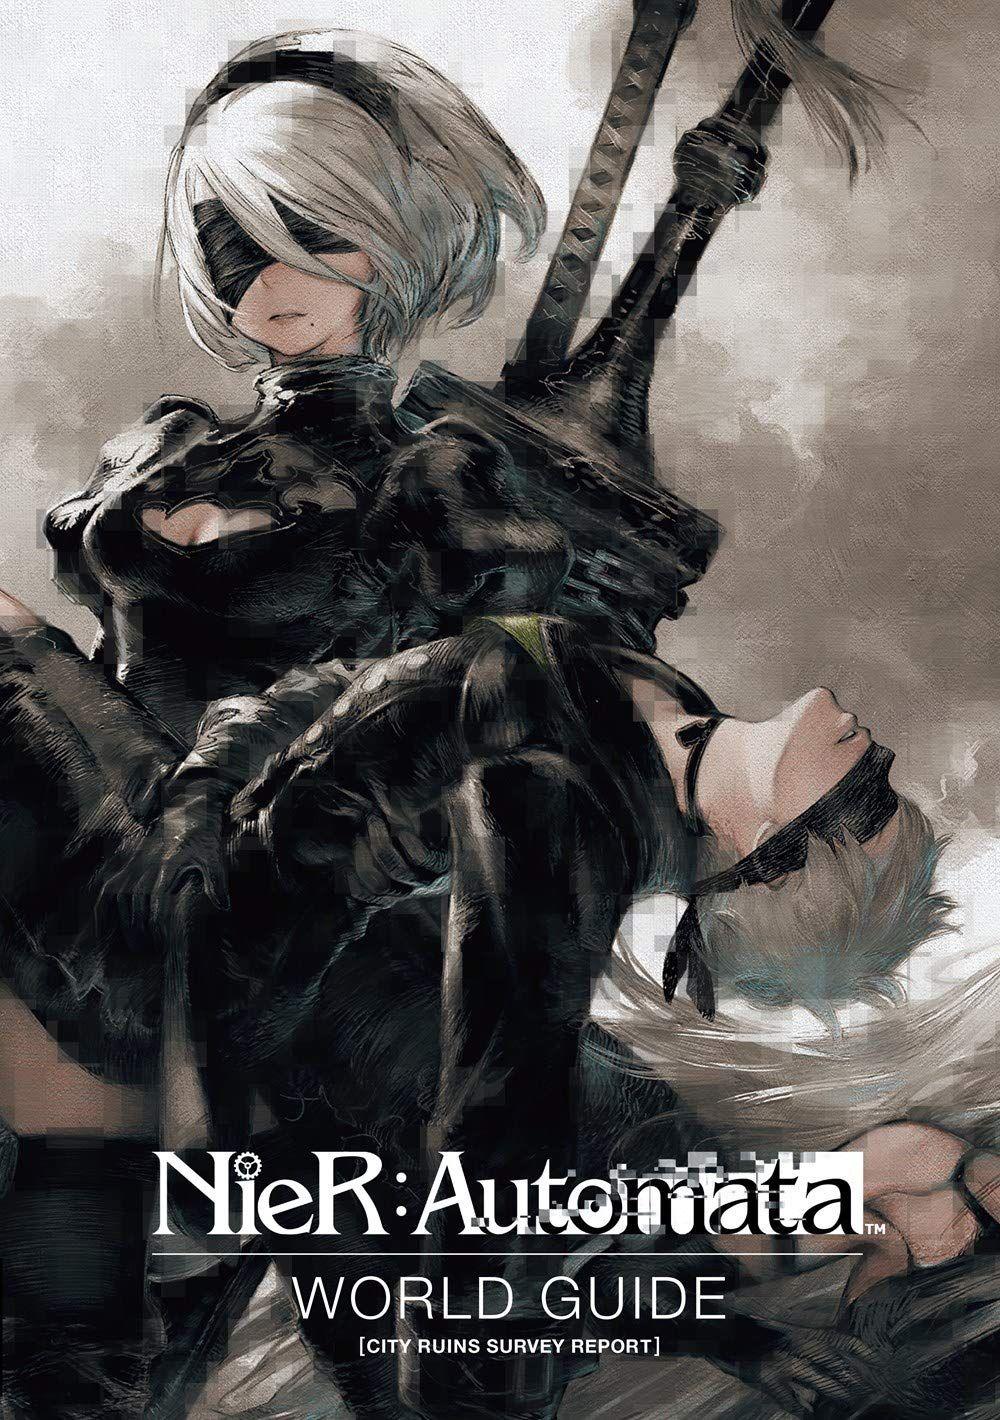 NieR: Automata - World Guide, Volume 1 - 1